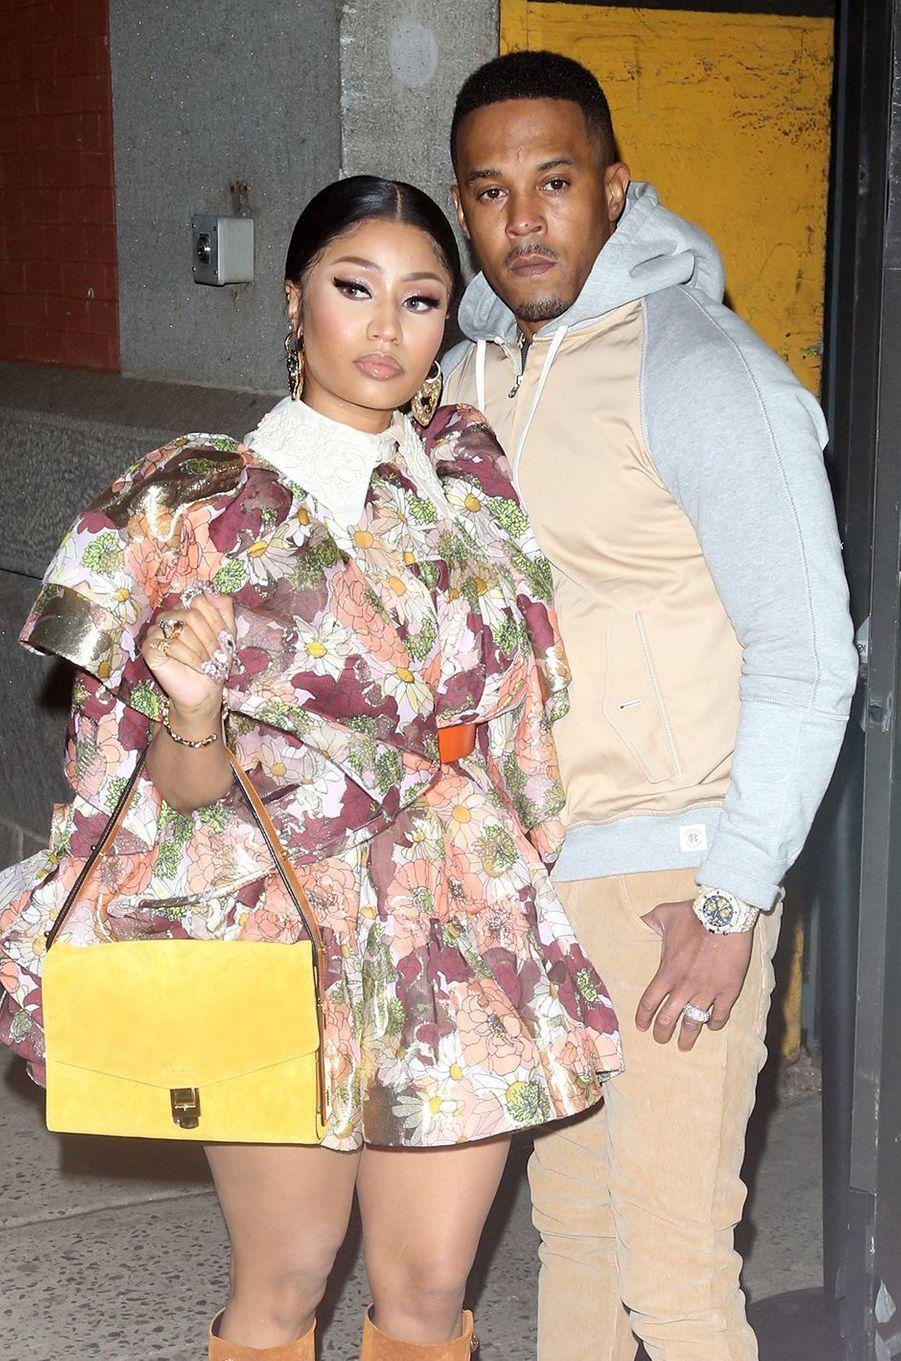 Nicki Minaj a eu son premier enfant avec son mari Kenneth Petty, un petit garçon né en septembre 2020.